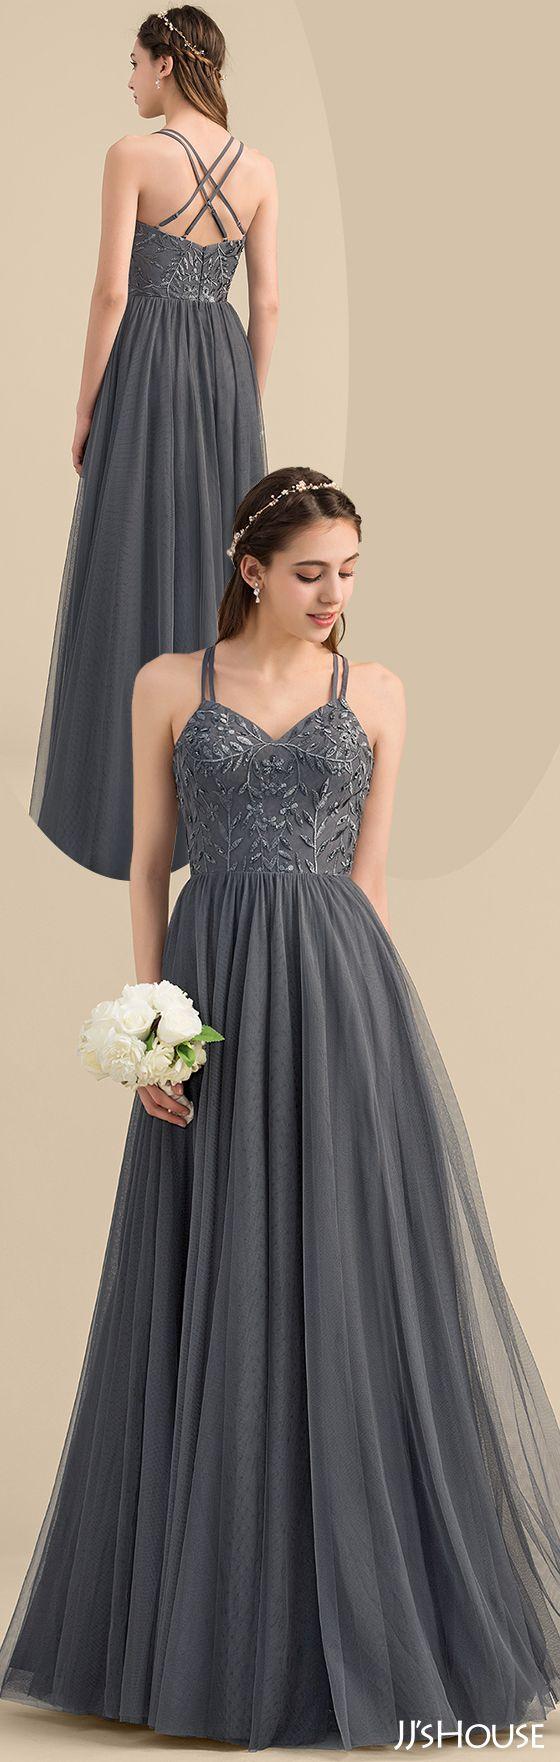 Alineprincess sweetheart floorlength tulle lace bridesmaid dress